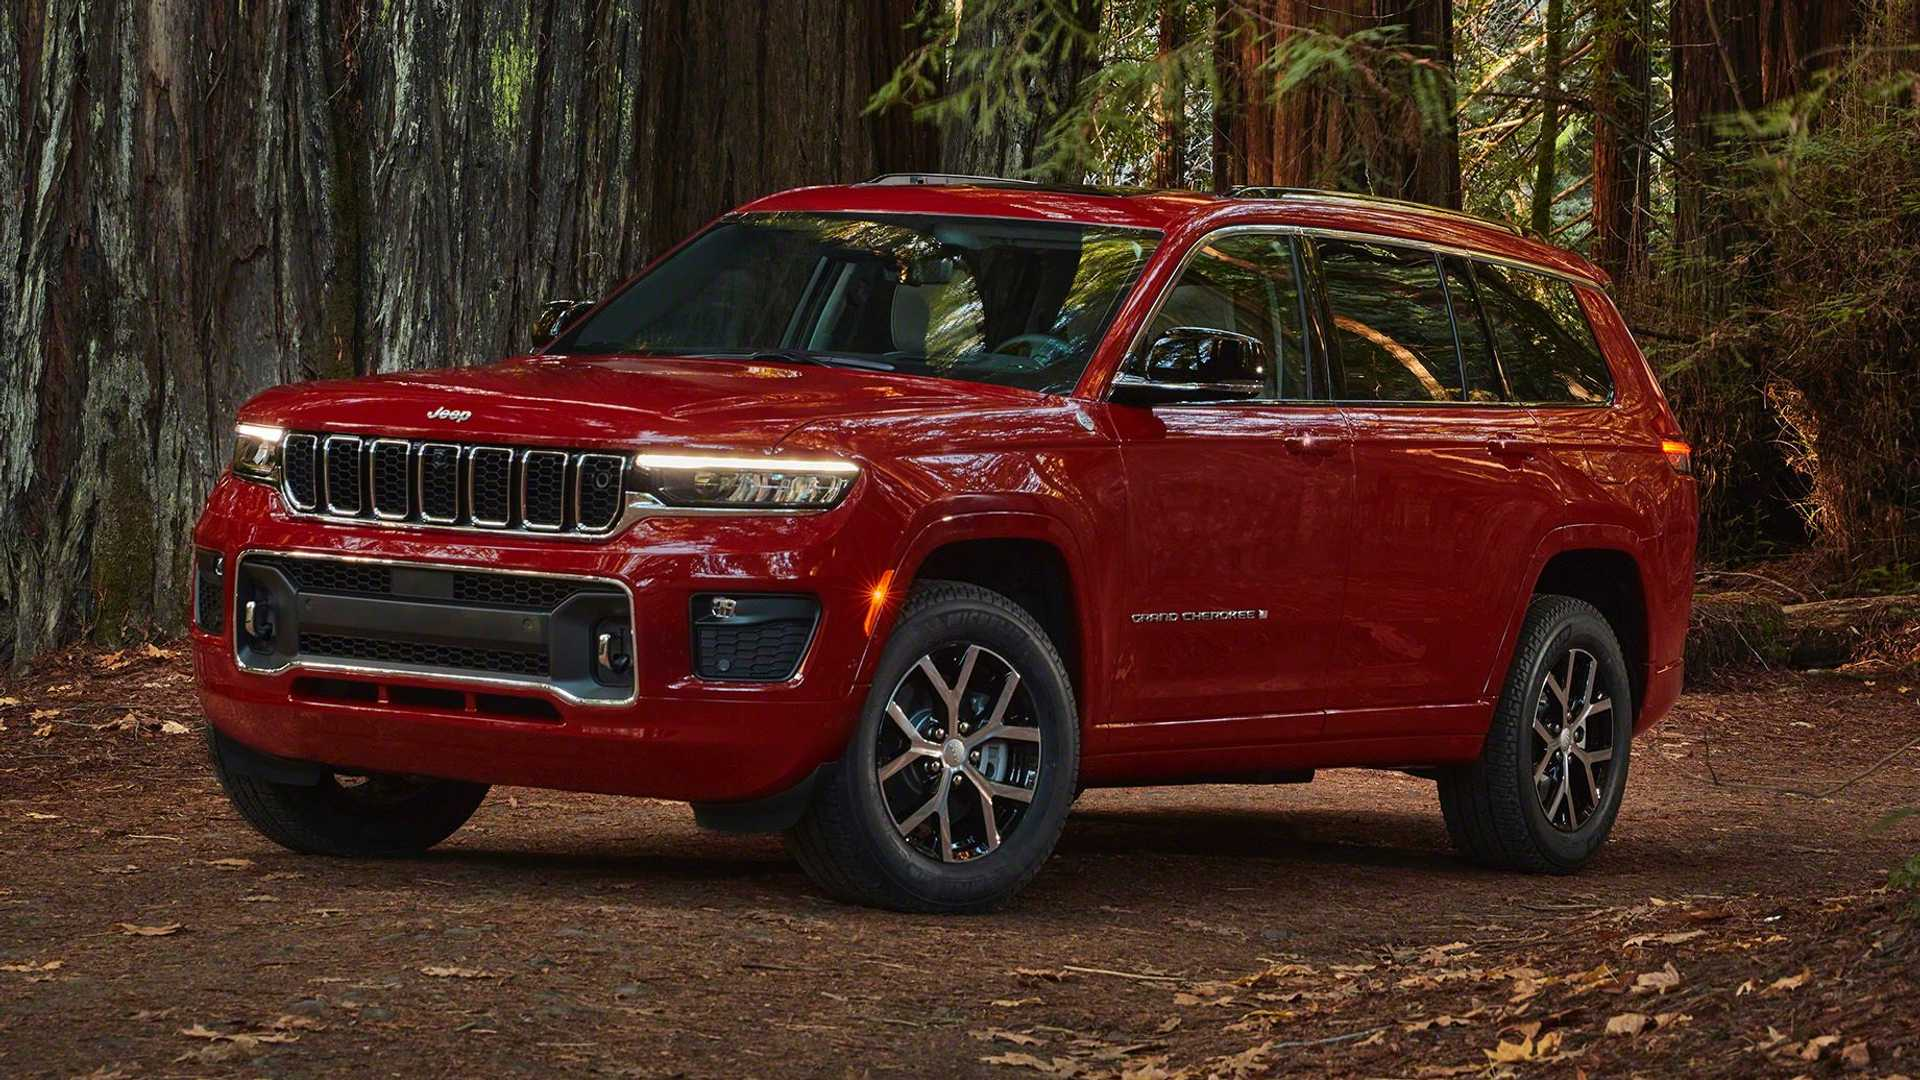 Jeep Grand Cherokee L 2021 года: цена от 36 995 долларов, верхняя отделка — 65 290 долларов